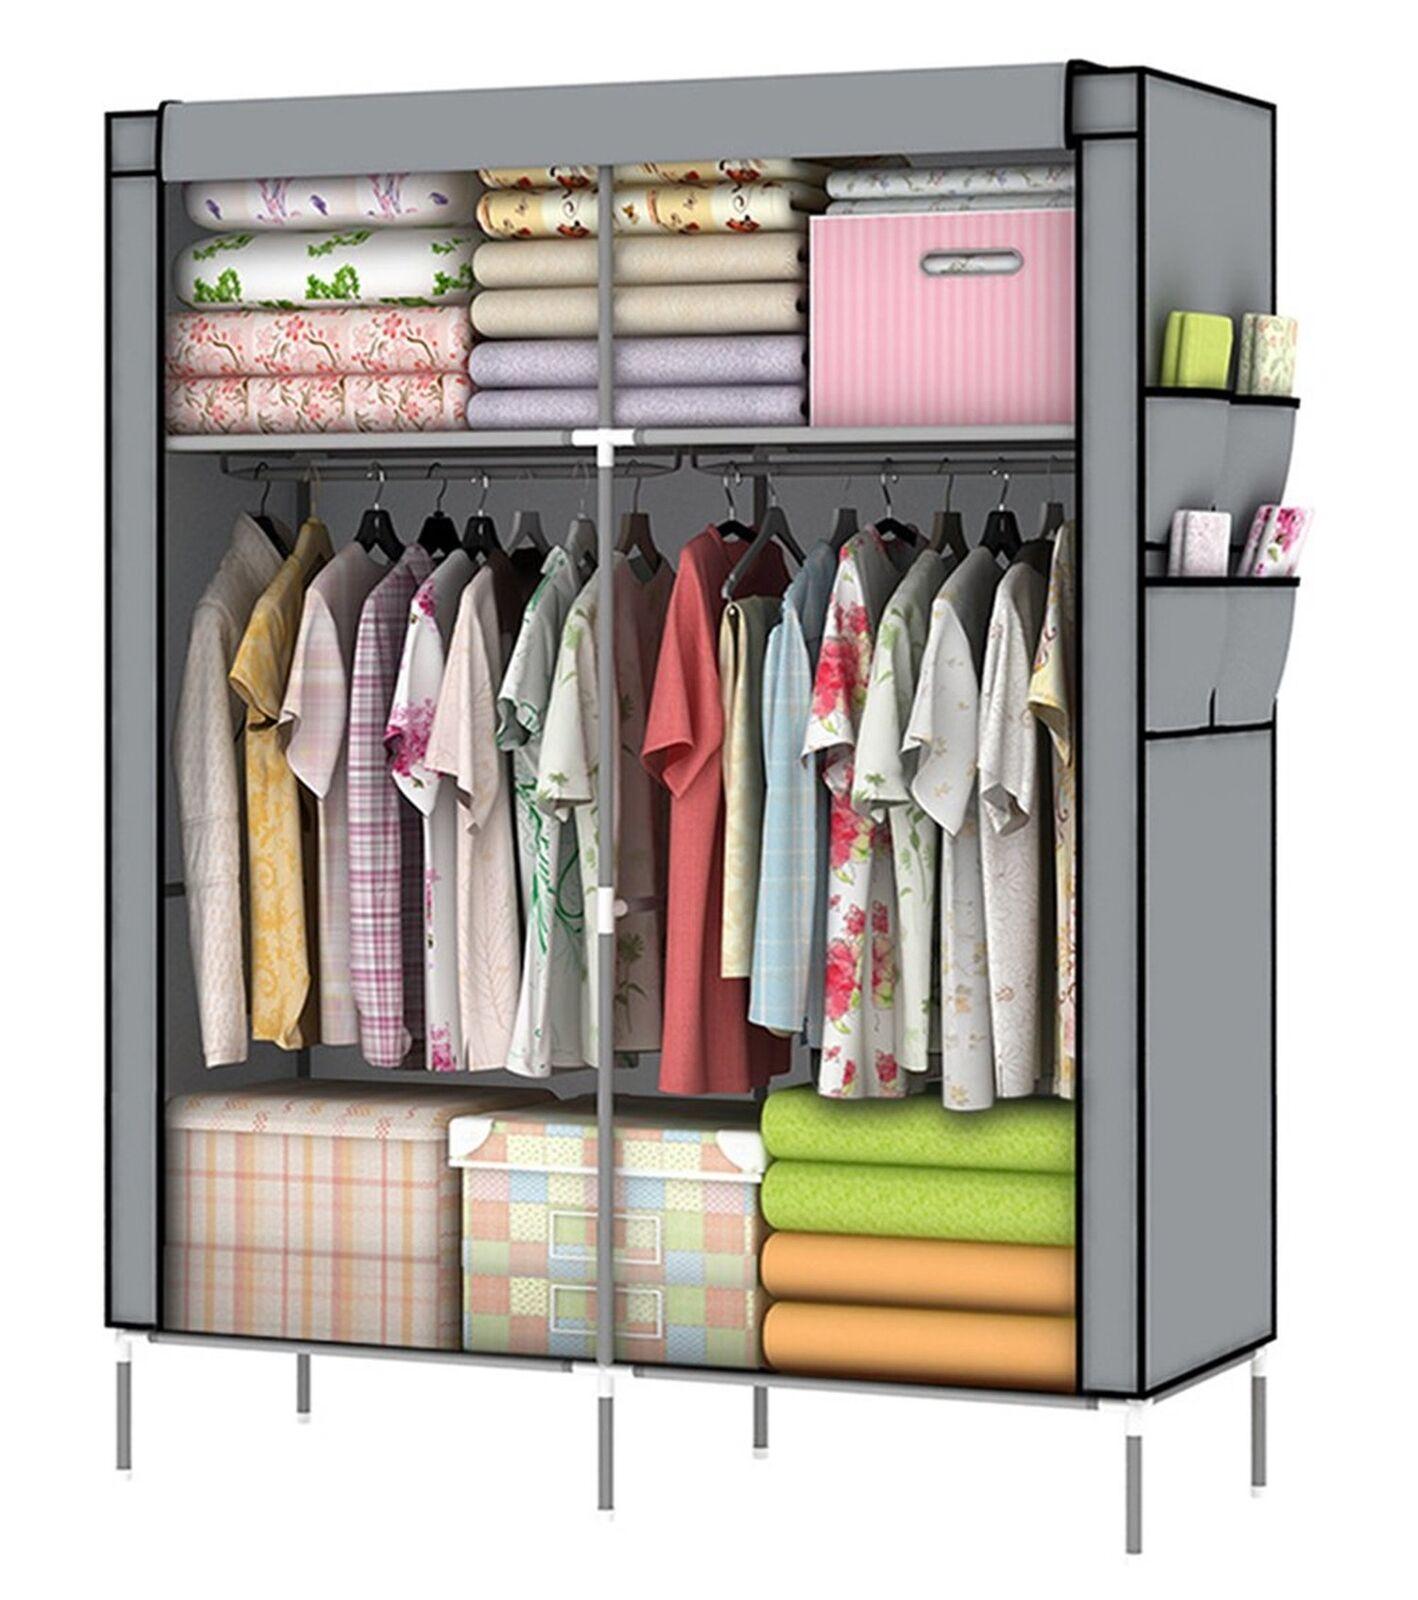 YOUUD Closet Portable Closet Organizer Portable Wardrobe Closet Clothes Close...